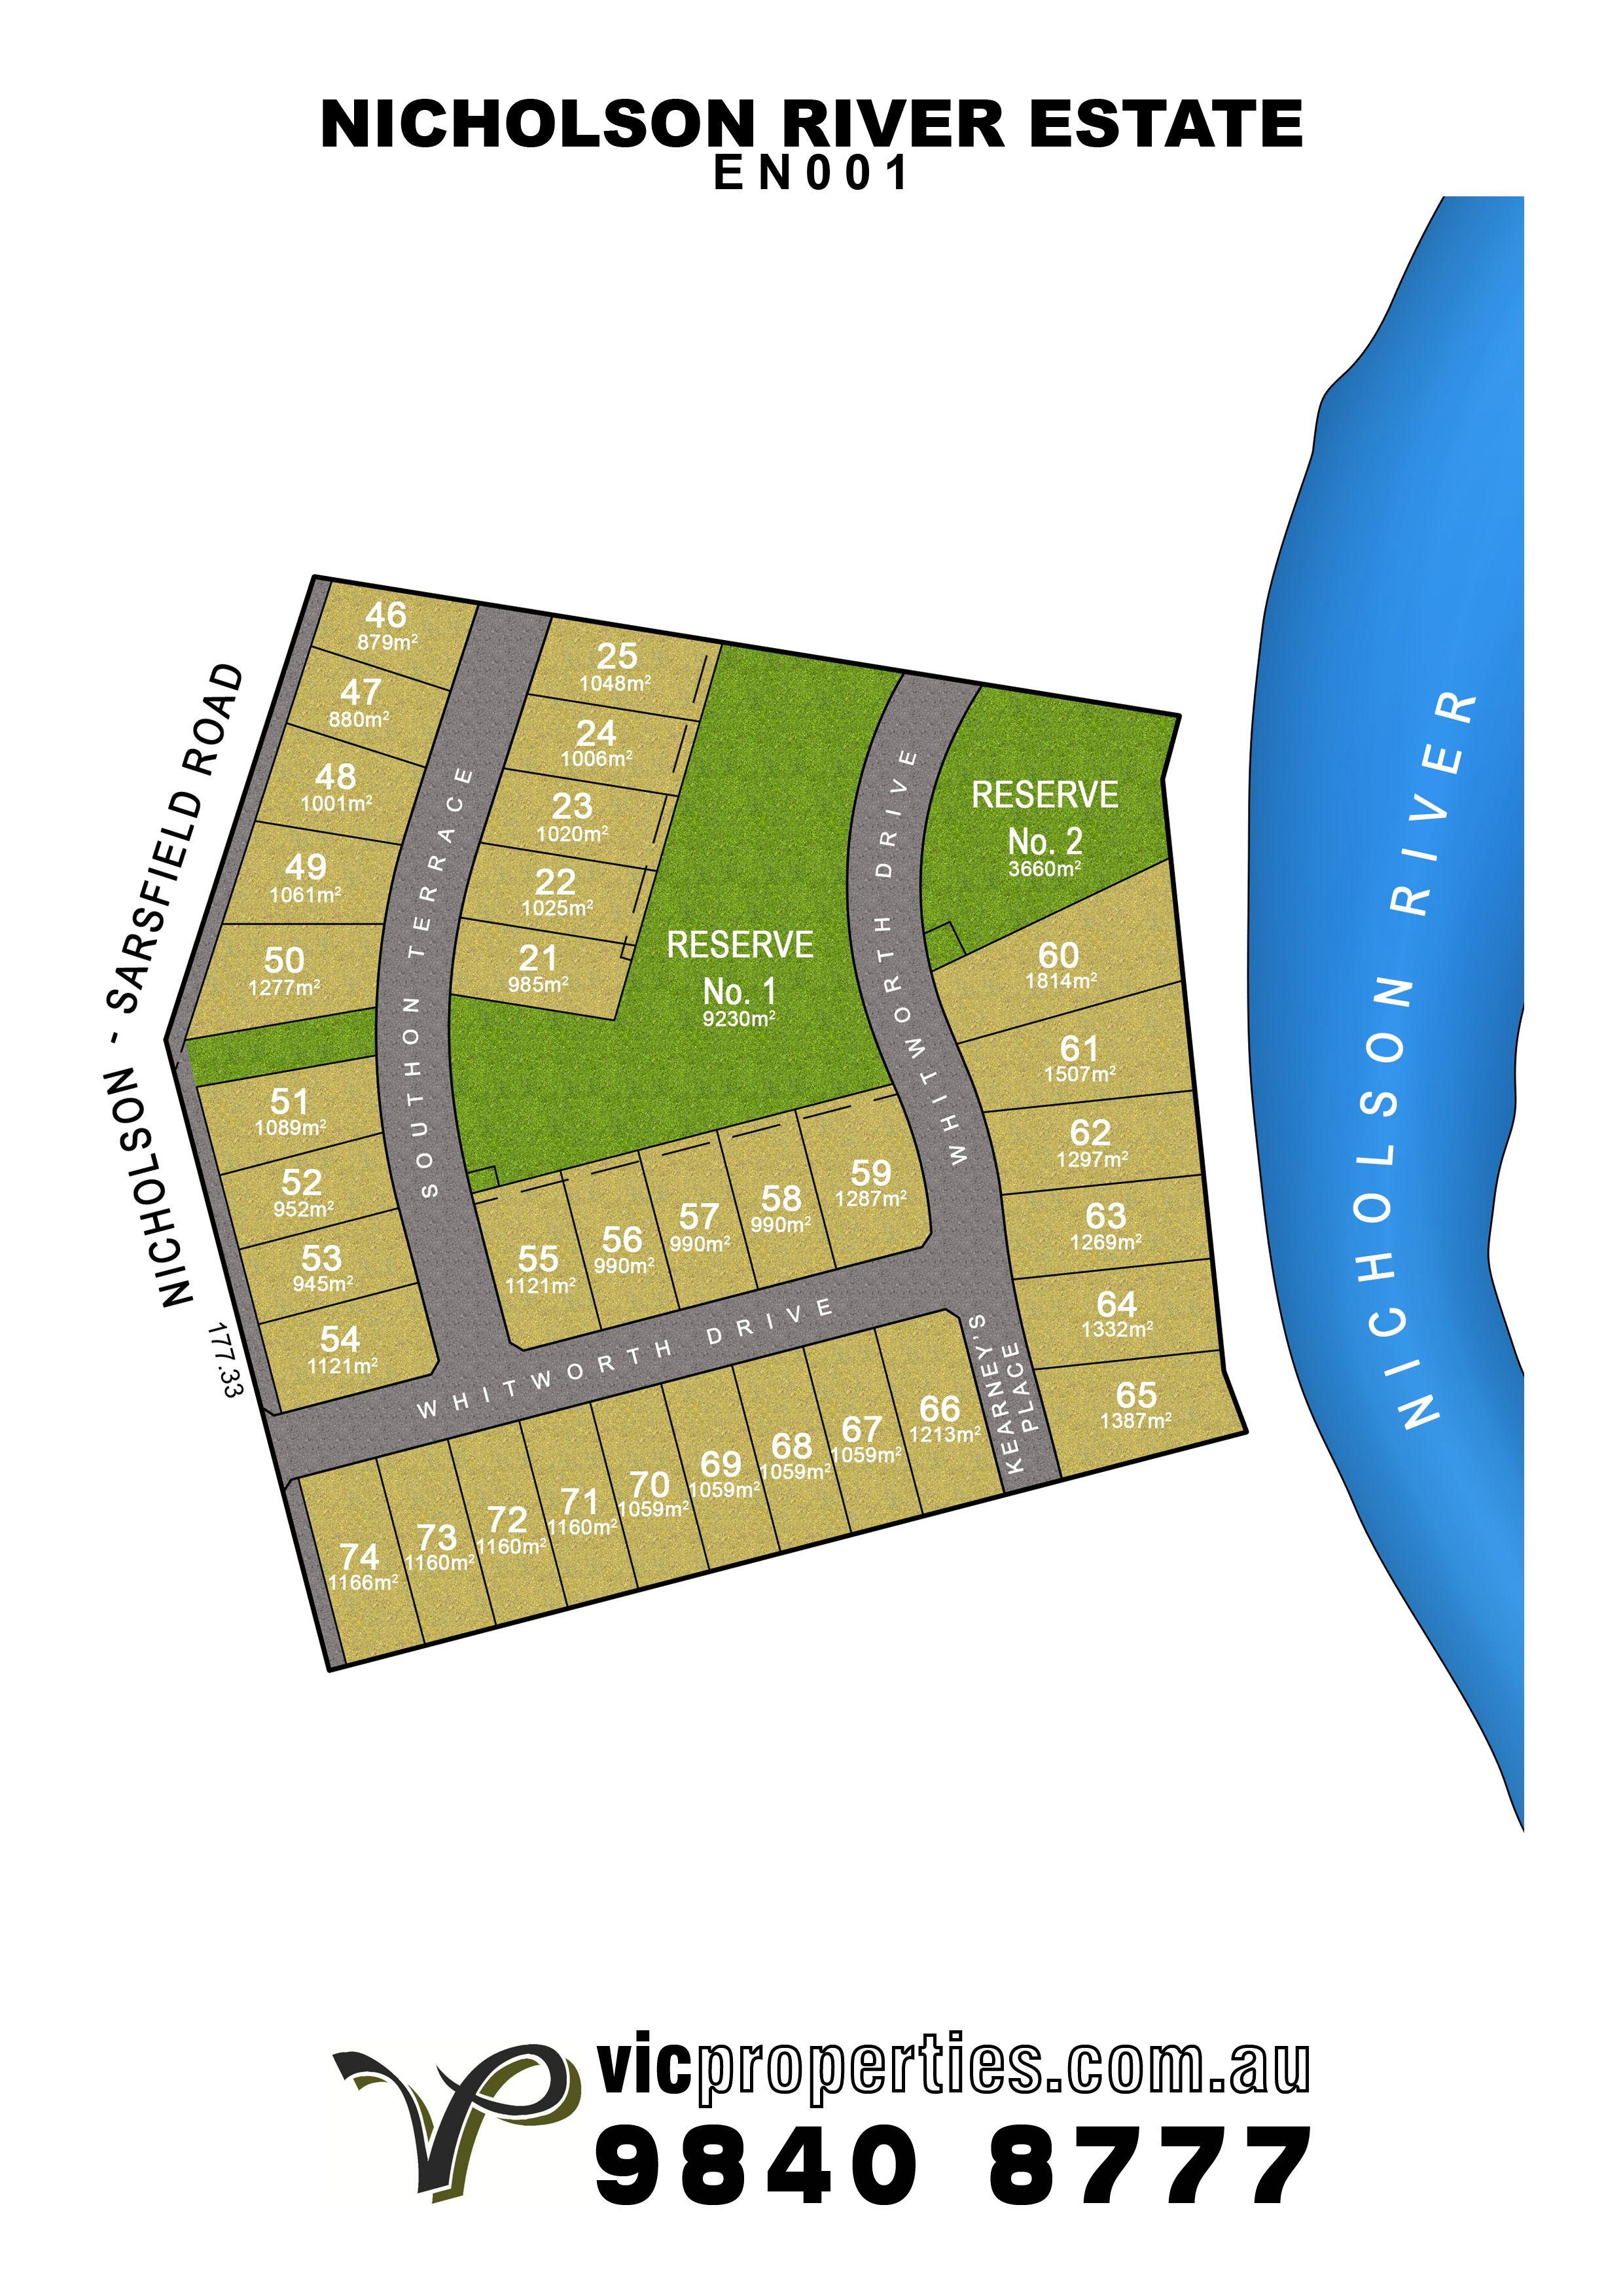 Lot 67/16 Whitworth Drive, Nicholson VIC 3882